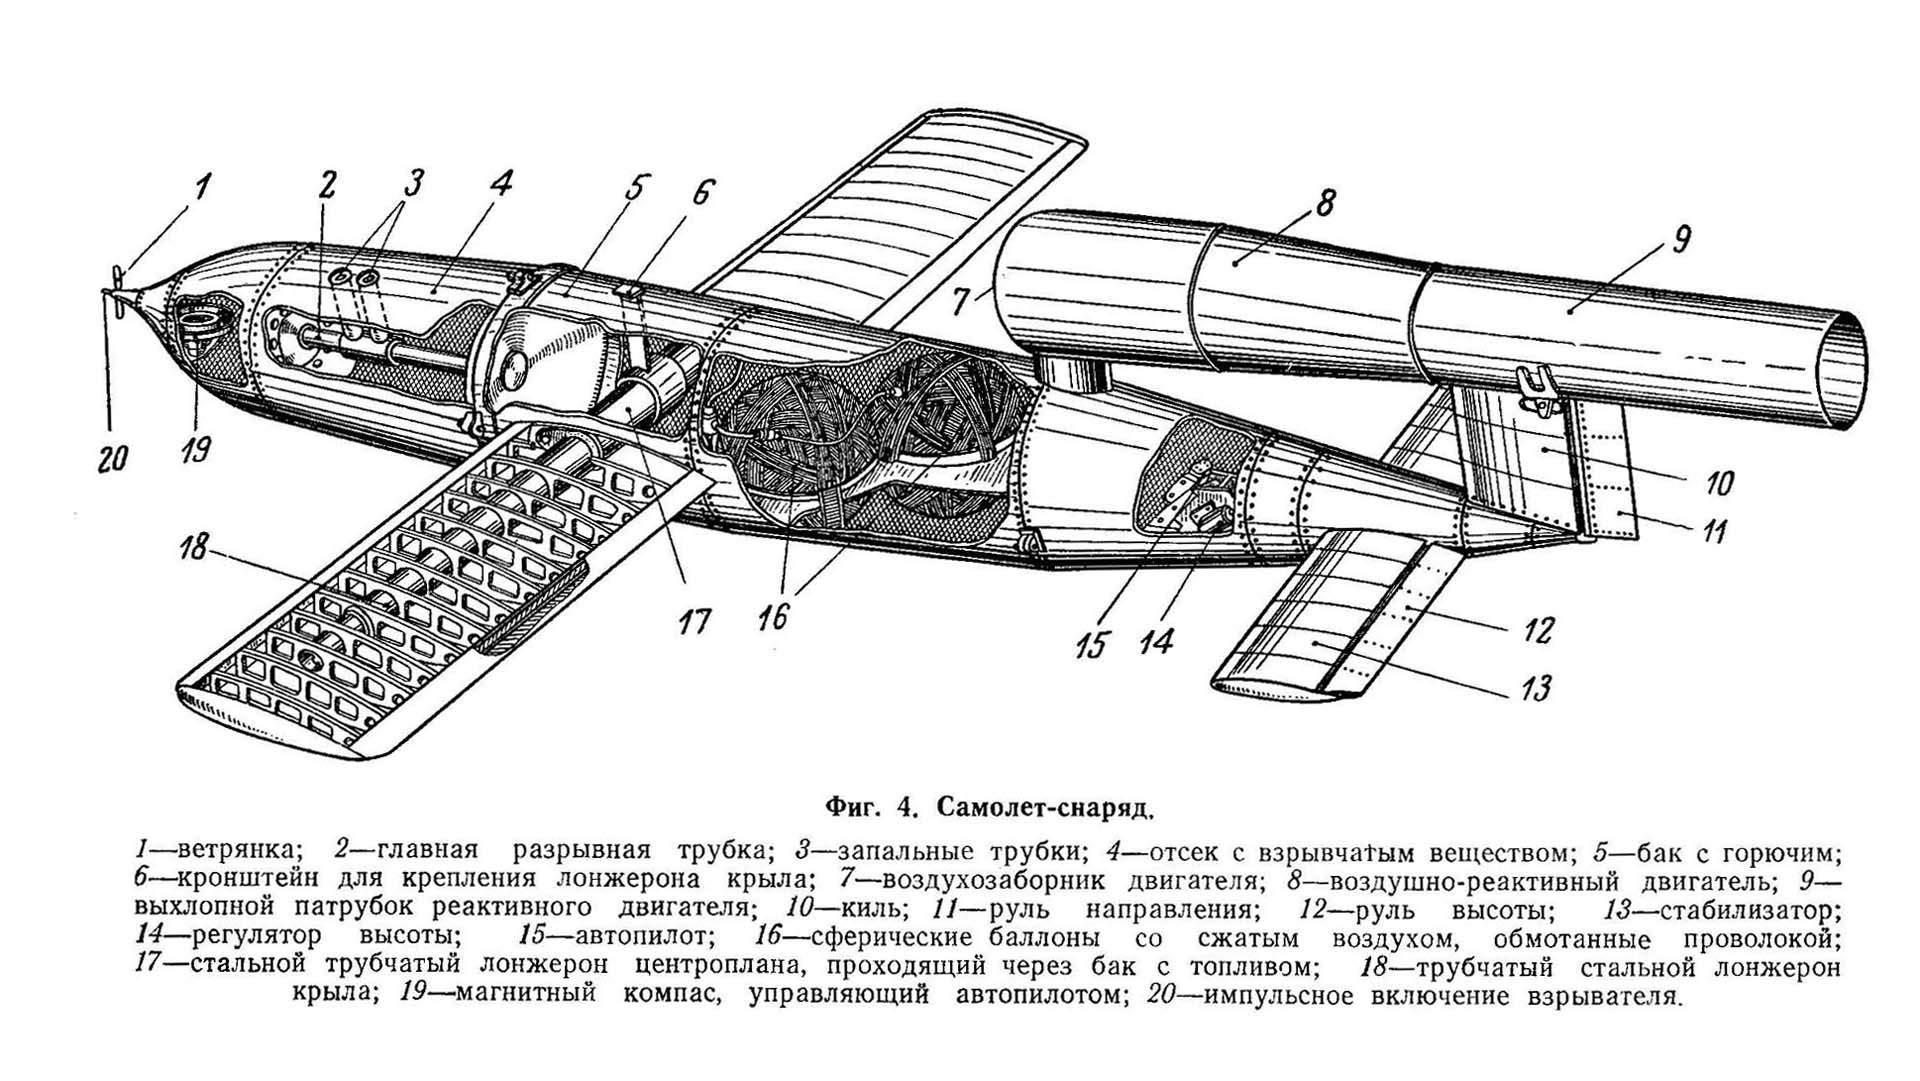 Сборник иллюстраций по курсу ...: http://www.airpages.ru/mn/sbornik_01.shtml